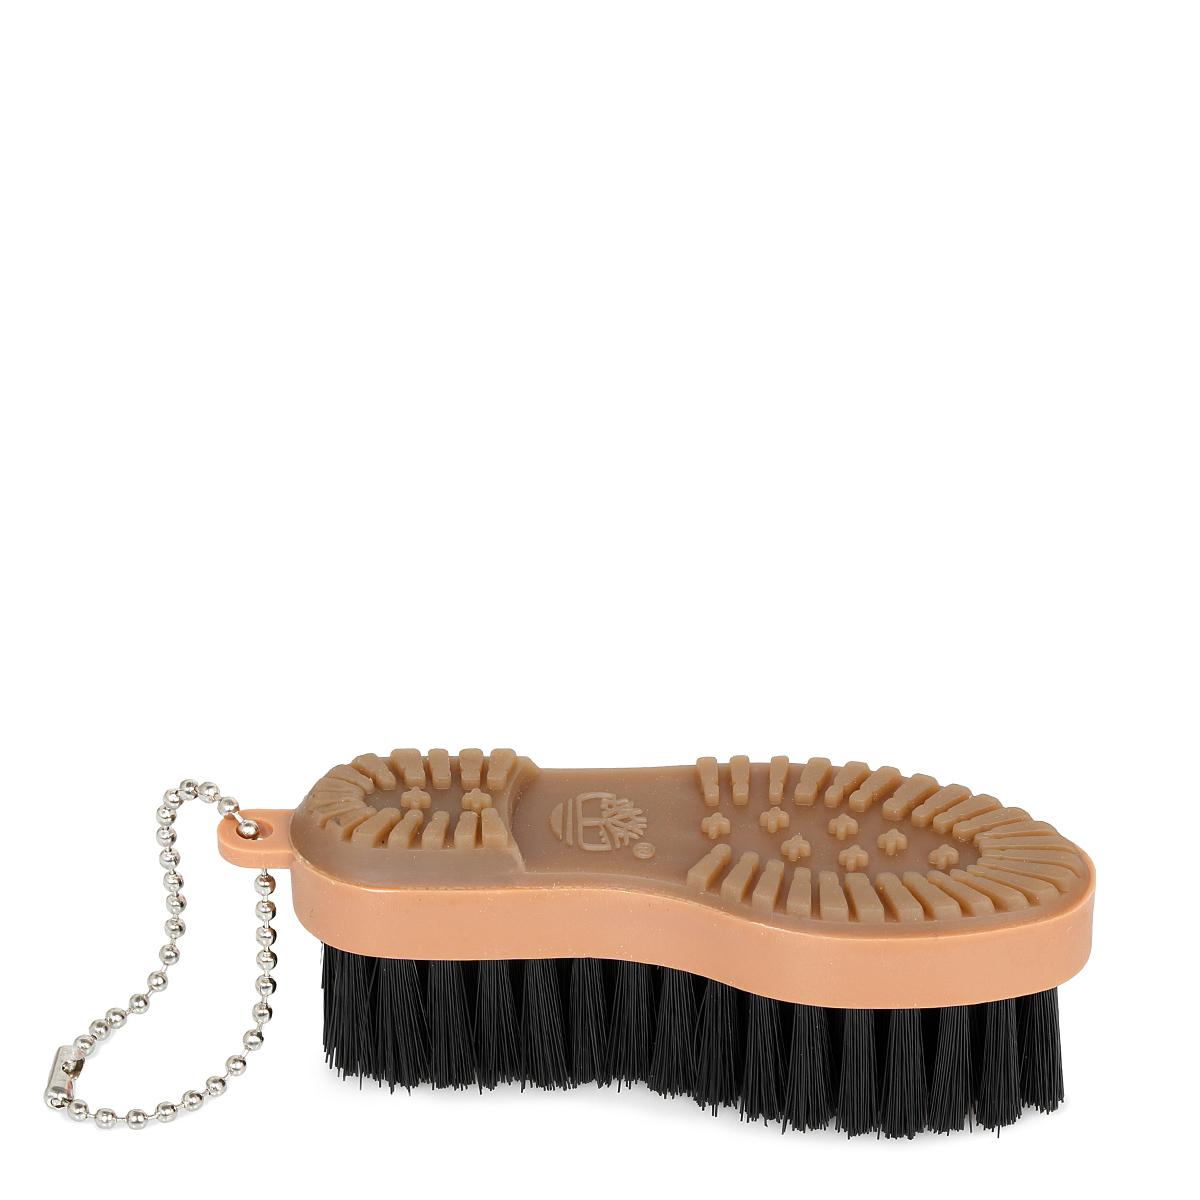 Suede Sole Shoe Brush